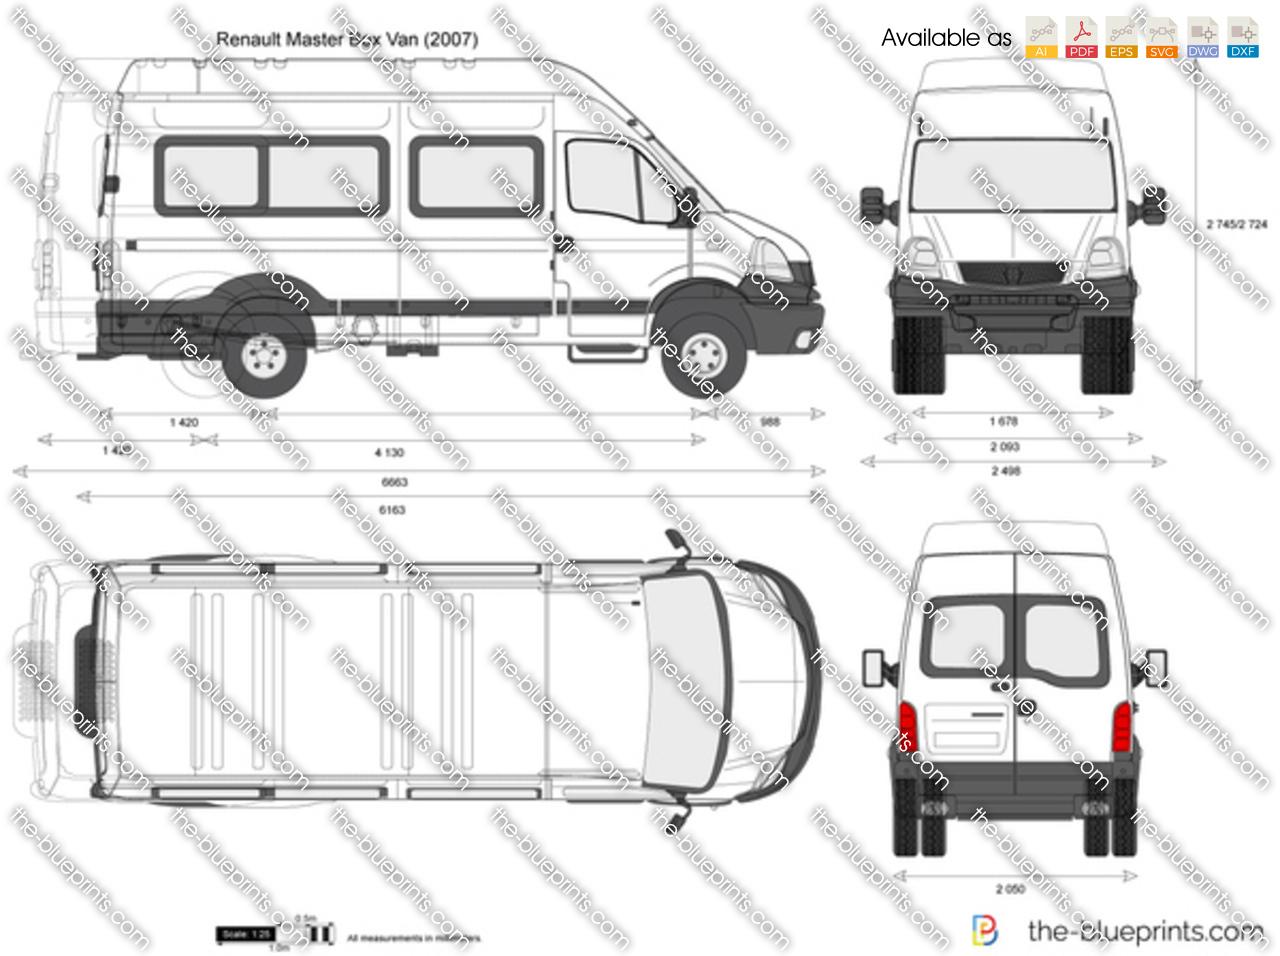 Renault Master Box Van 2004